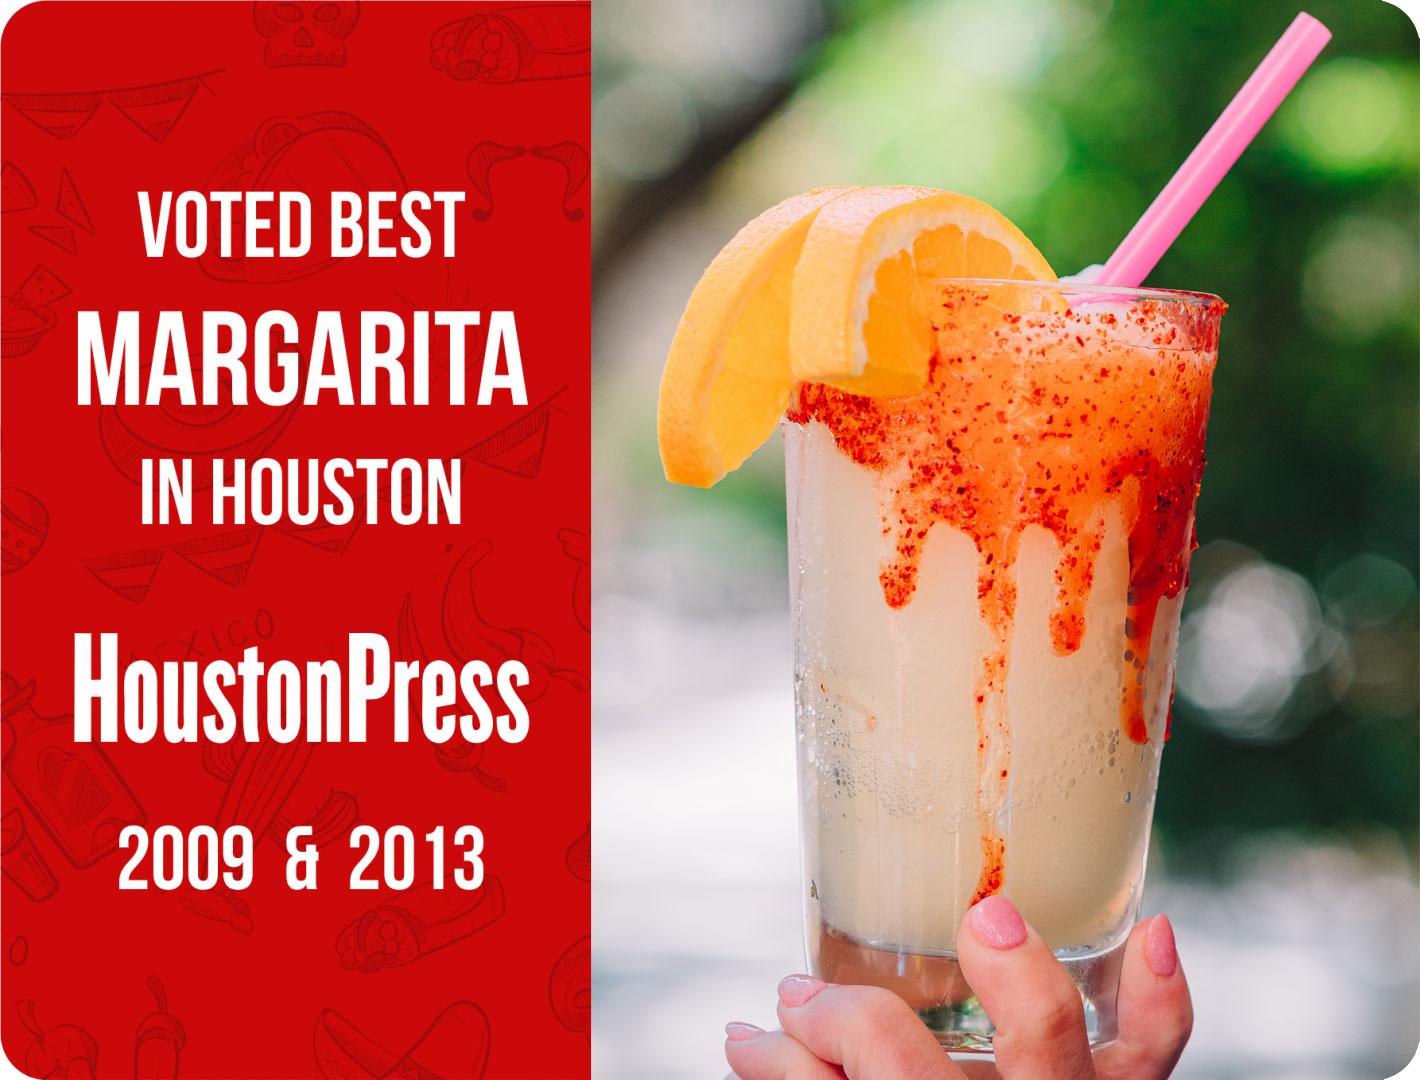 Voted Best Margarita in Houston by Houston Press